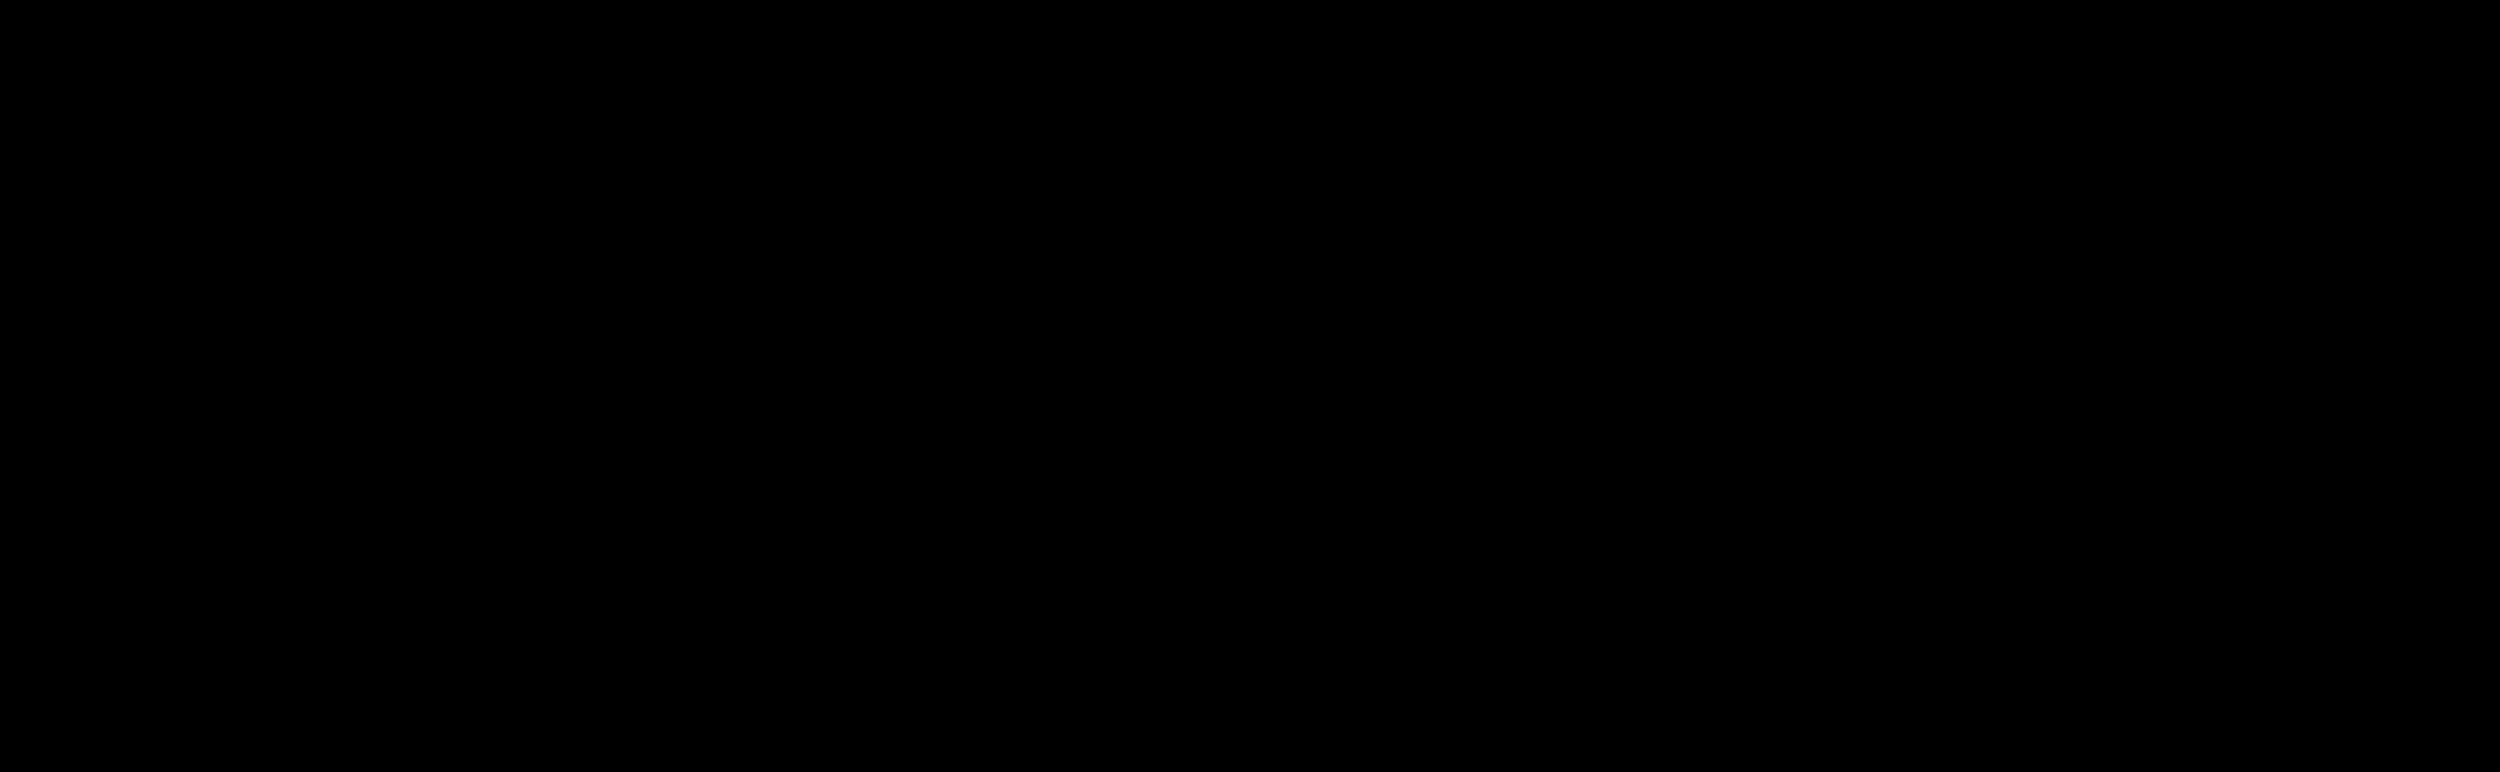 Paperchaselogo_web_black_PNG.png